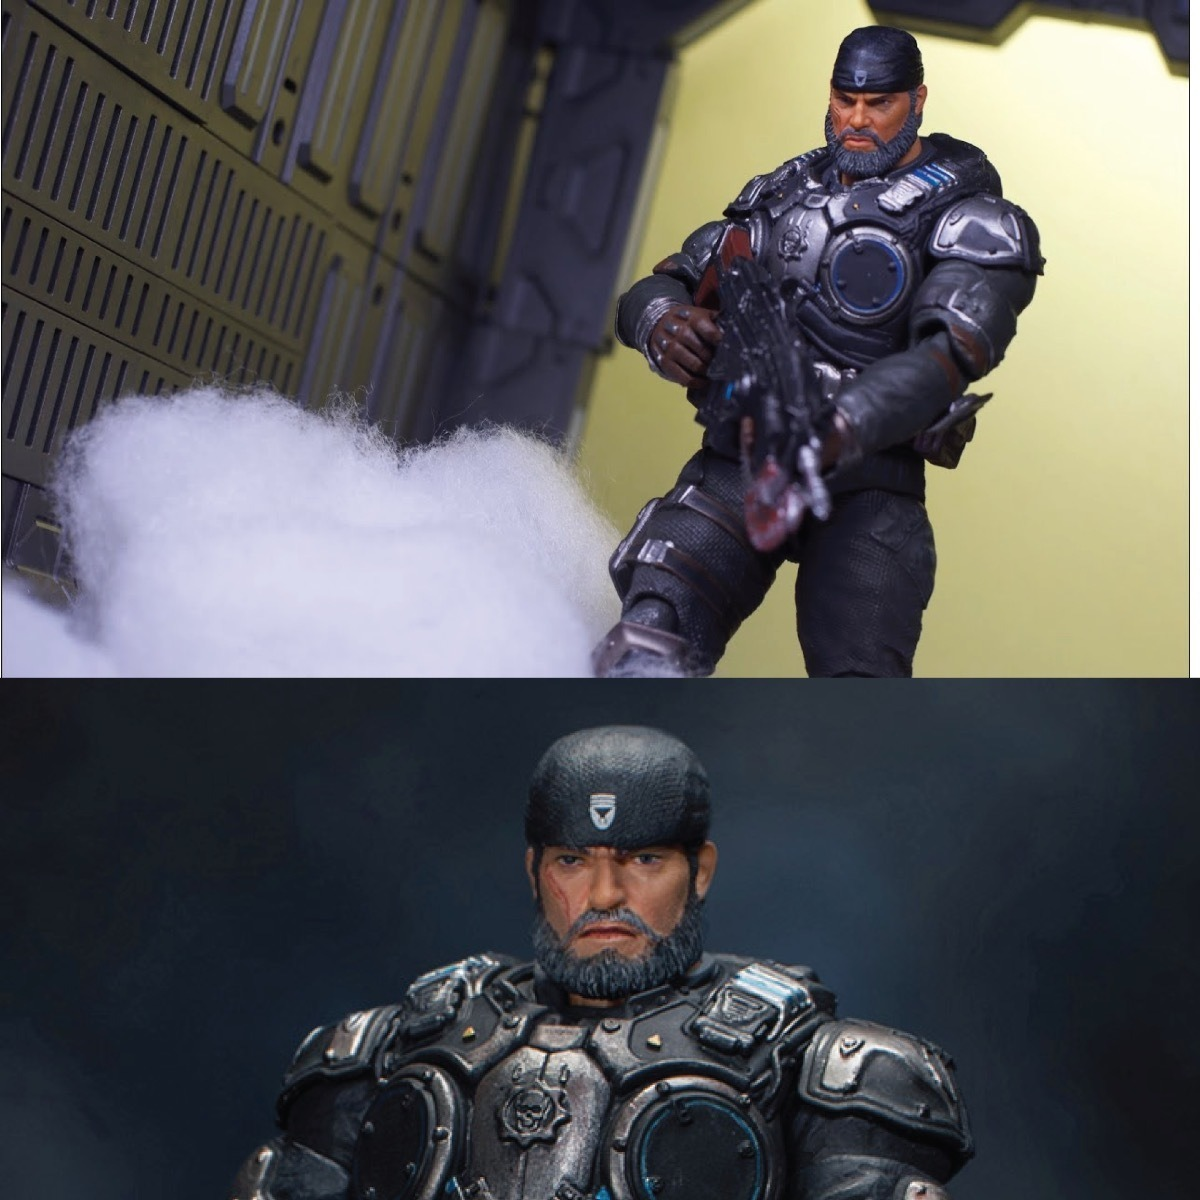 Marcus Fenix Gears Of War 5 Storm Collectibles